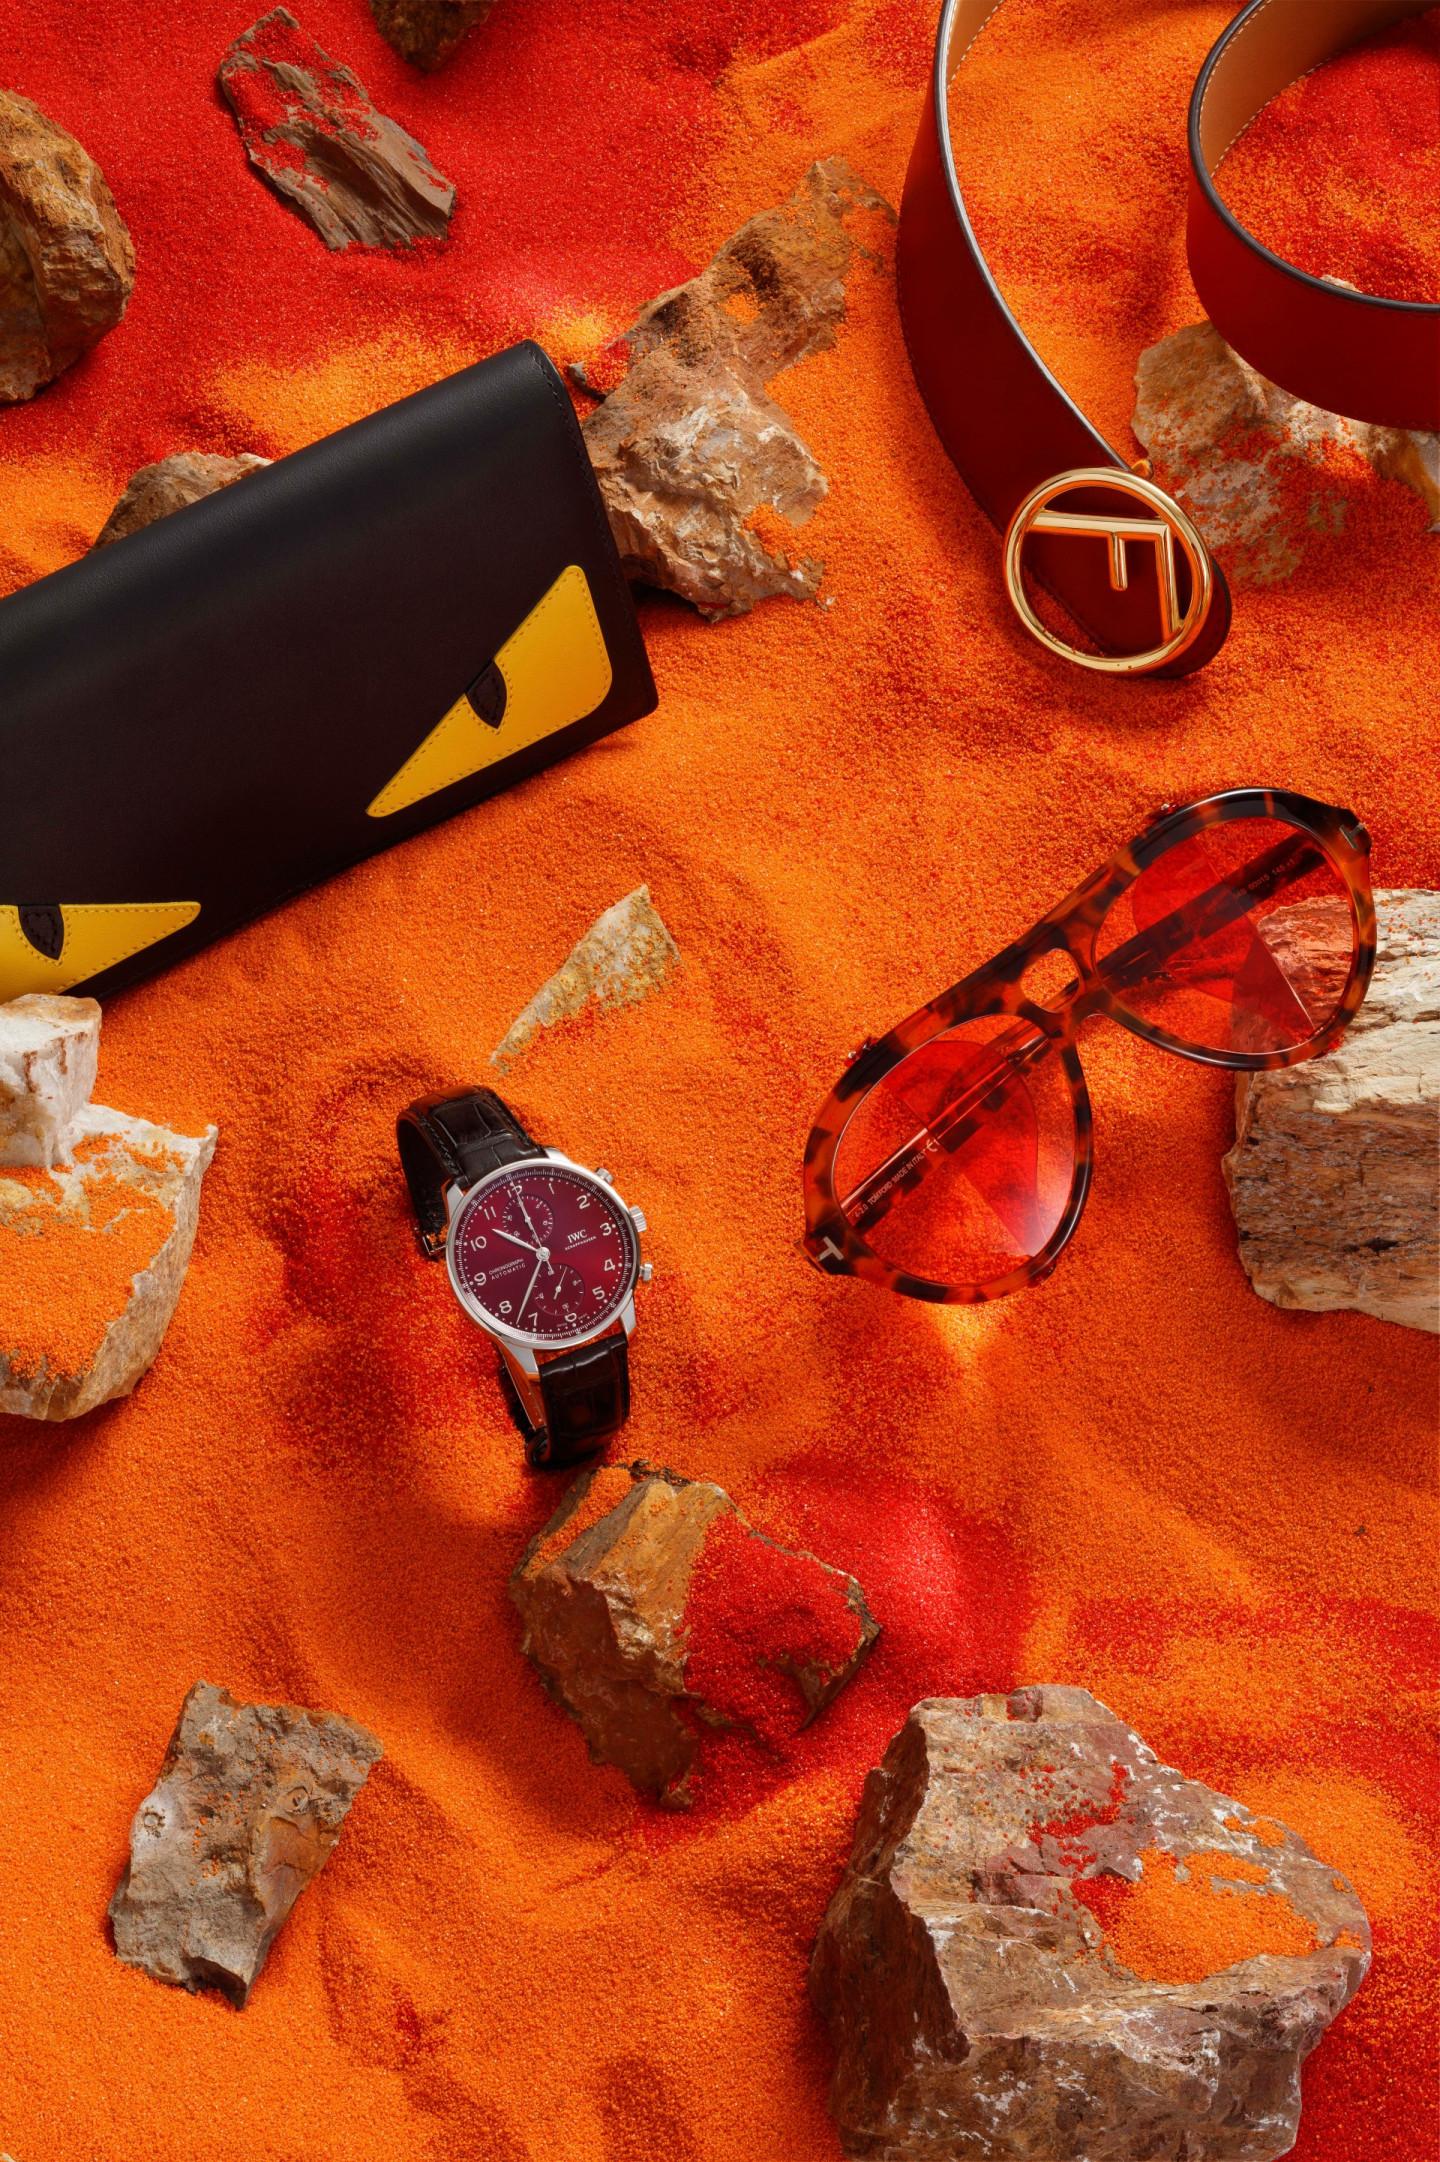 Портмоне, ремень — все Fendi (бутик Fendi); очки Tom Ford (ЦУМ); часы Portugieser Chronograph, IWC Schaffhausen (бутик IWC Schaffhausen)